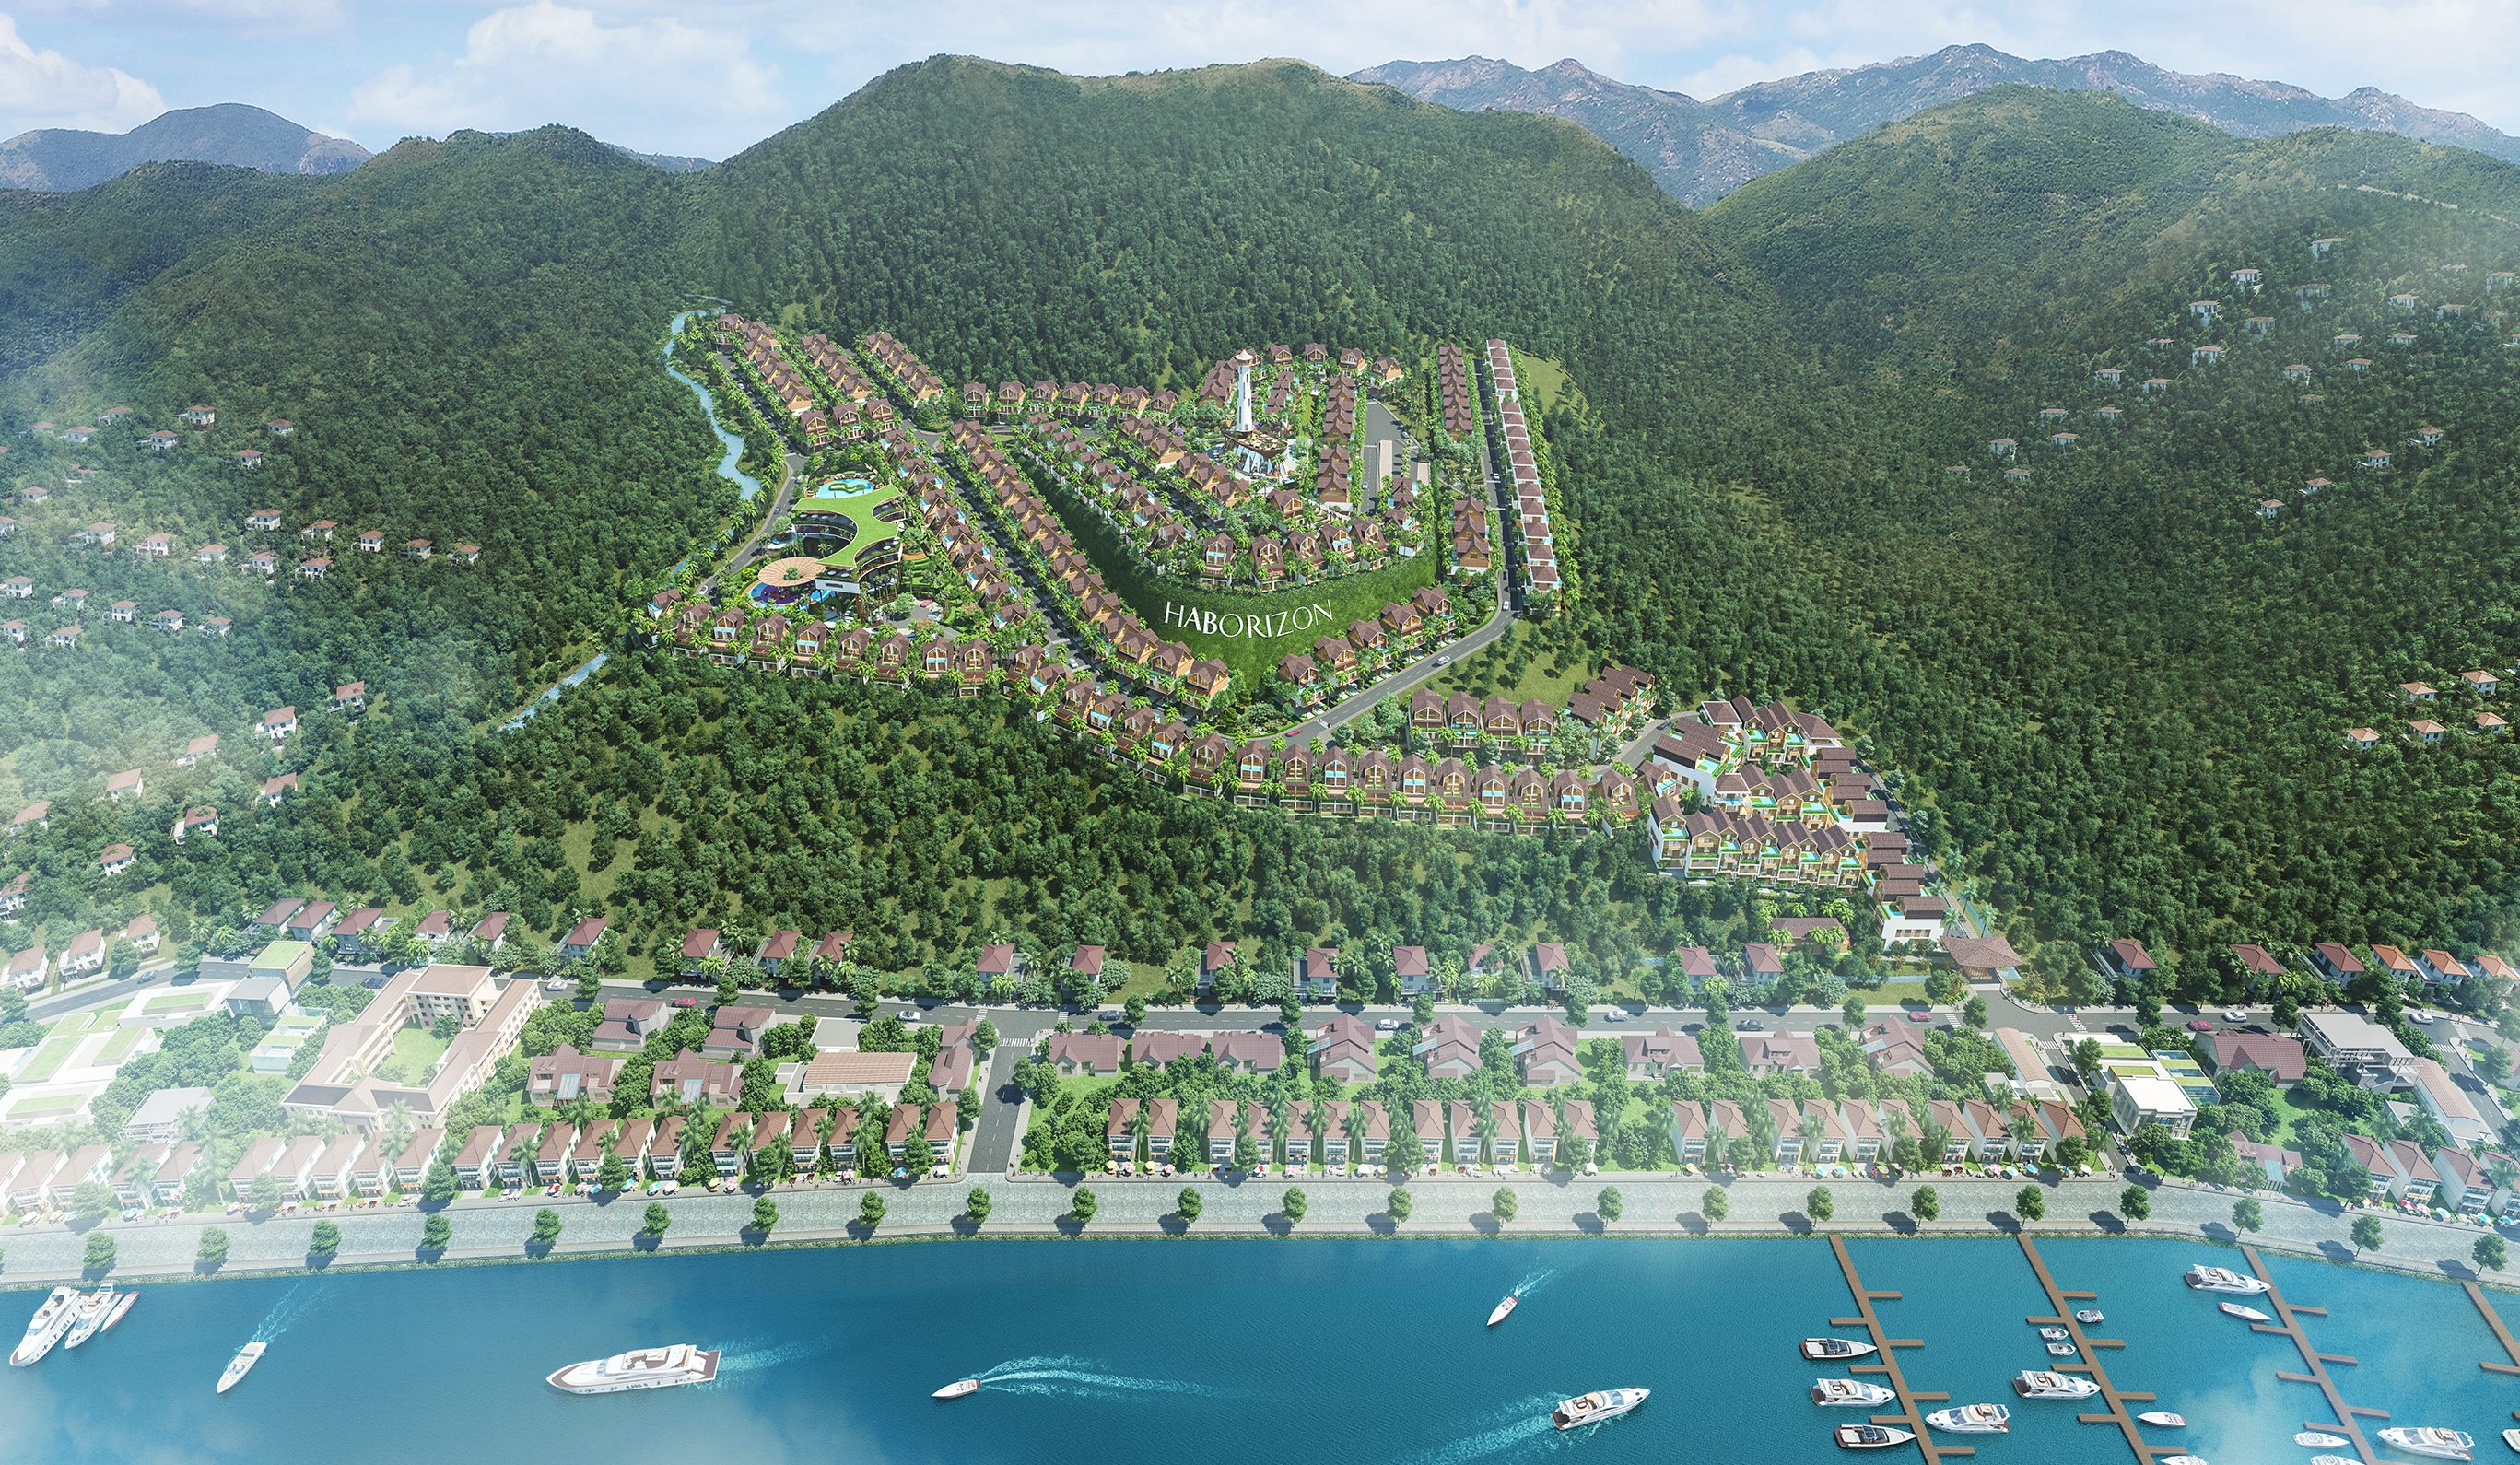 Biệt thự Haborizon Nha Trang